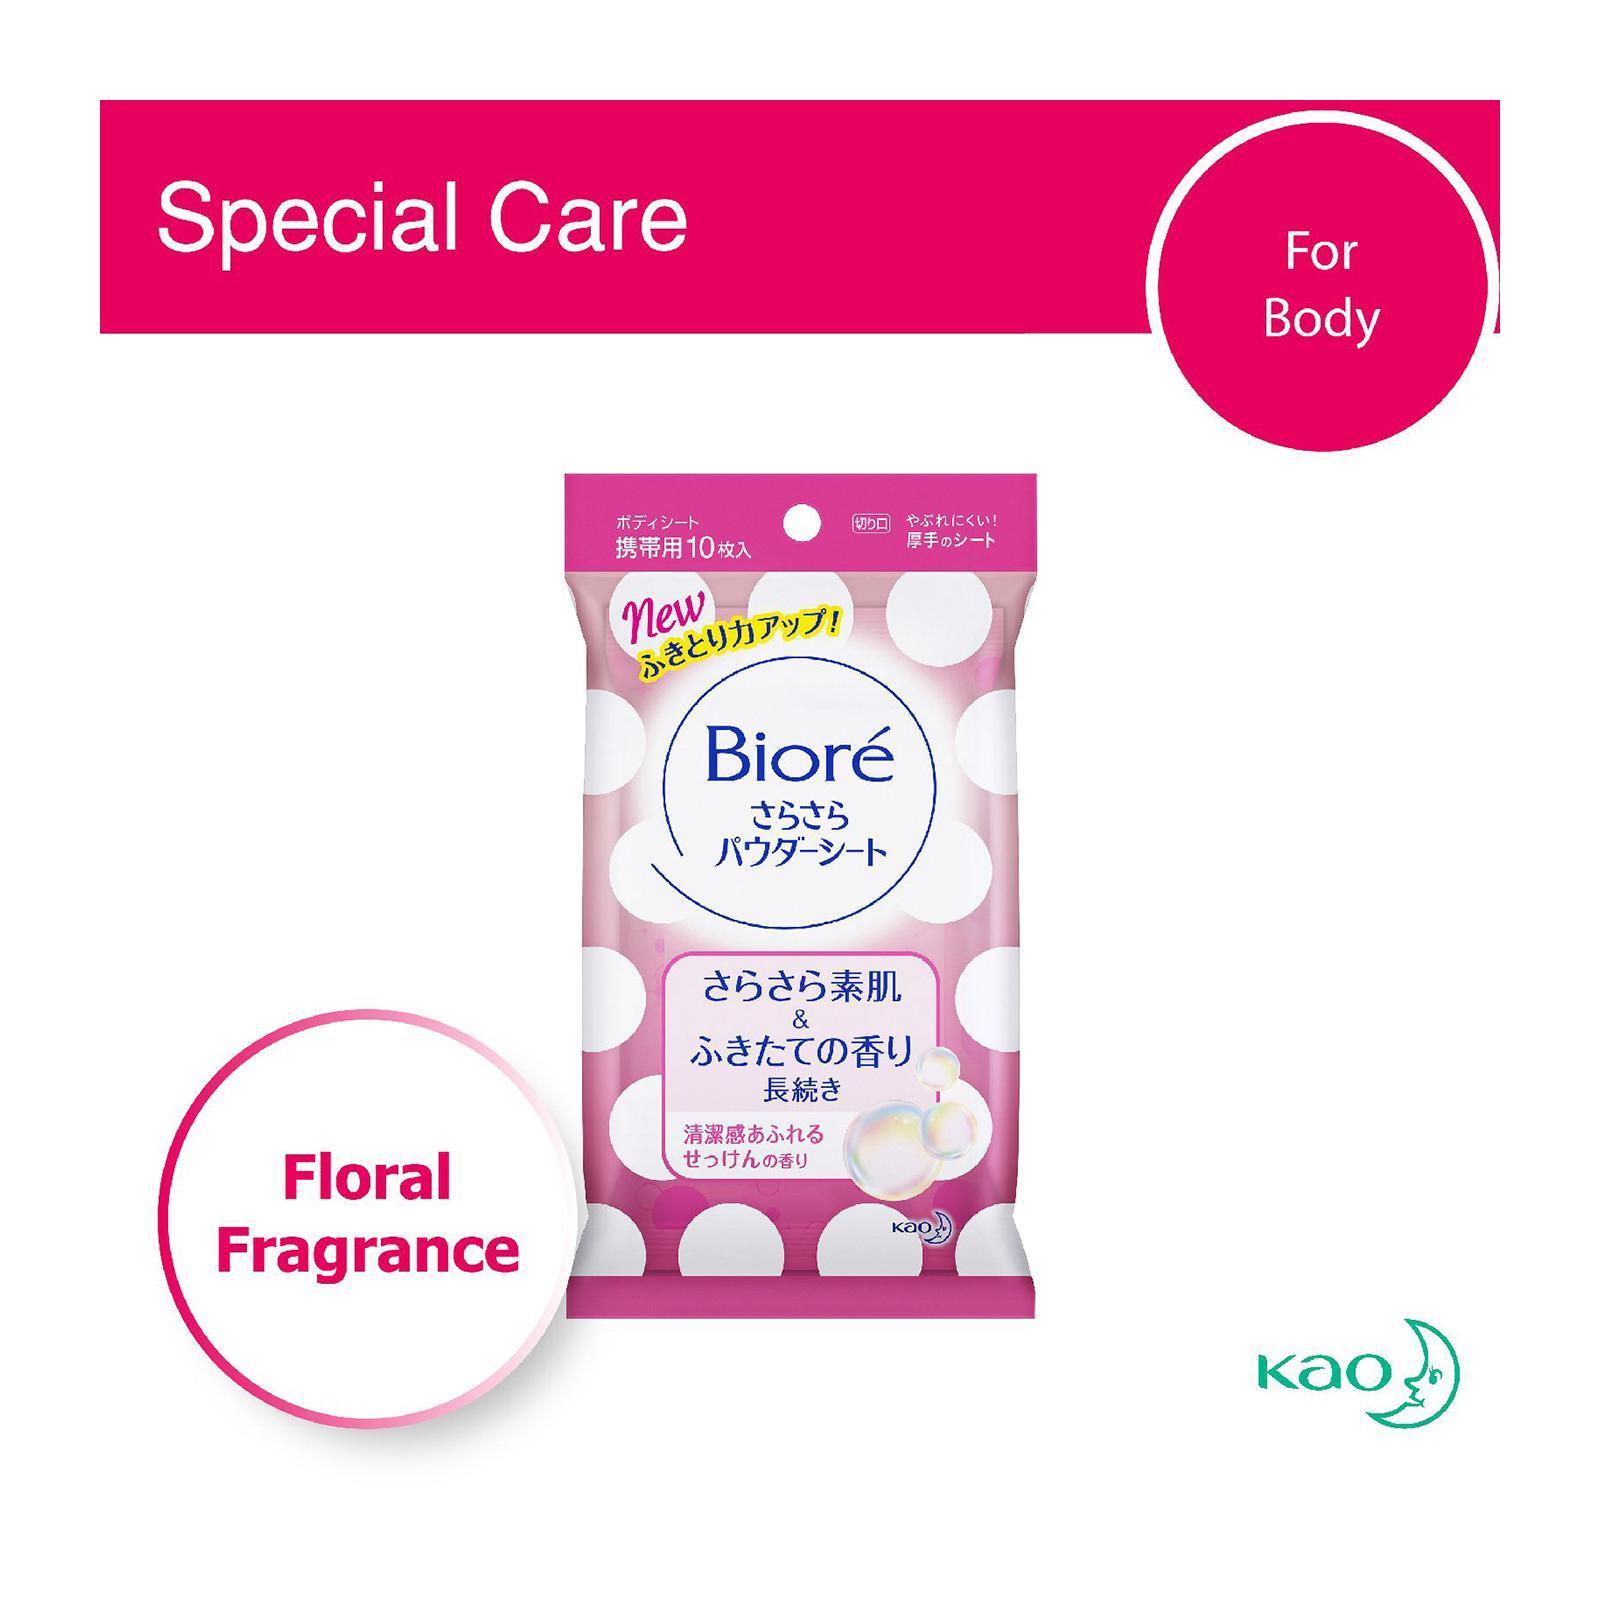 BIORE sara sara body powder sheets breezy floral fragrance 10s